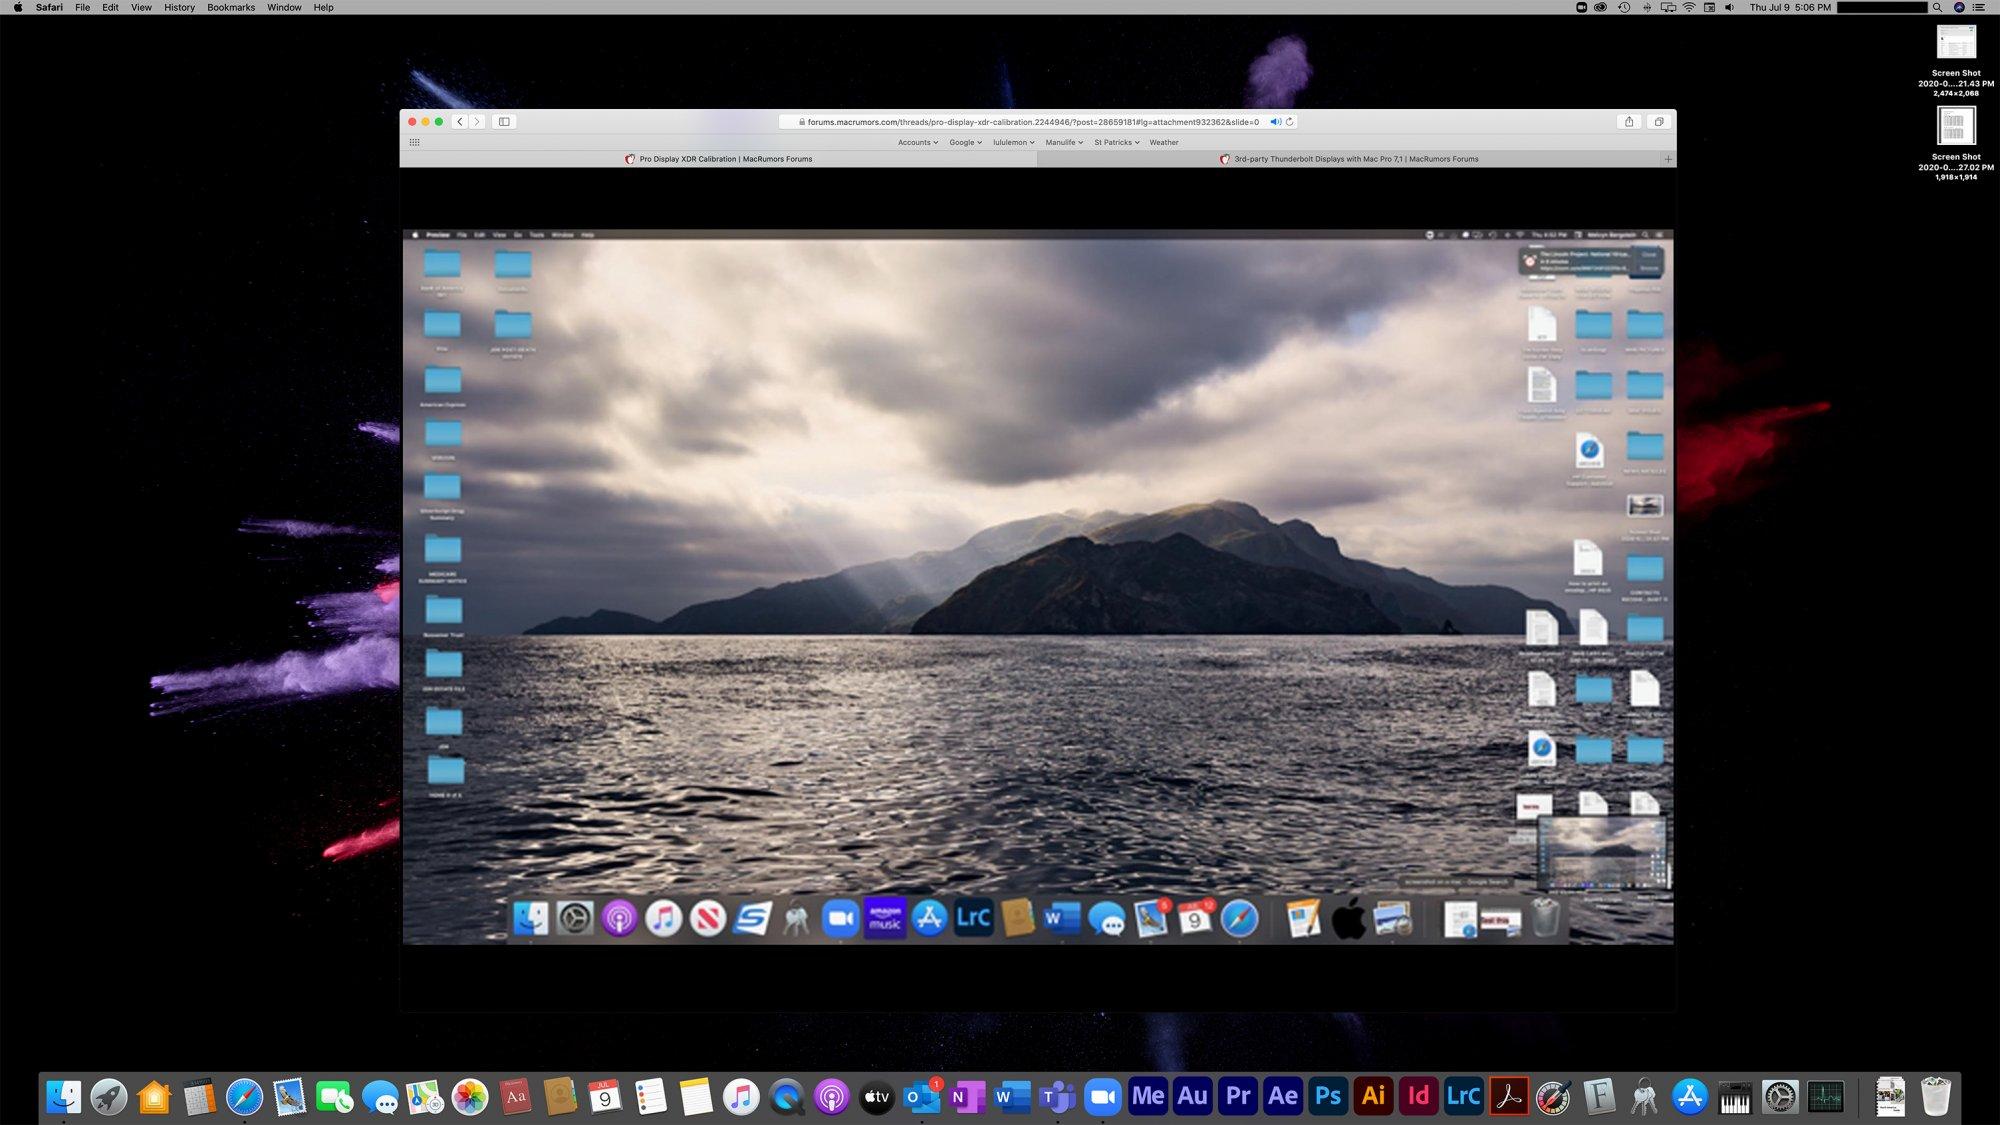 Screen Shot 2020-07-09 at 5.06.30 PM@0.5x.jpg